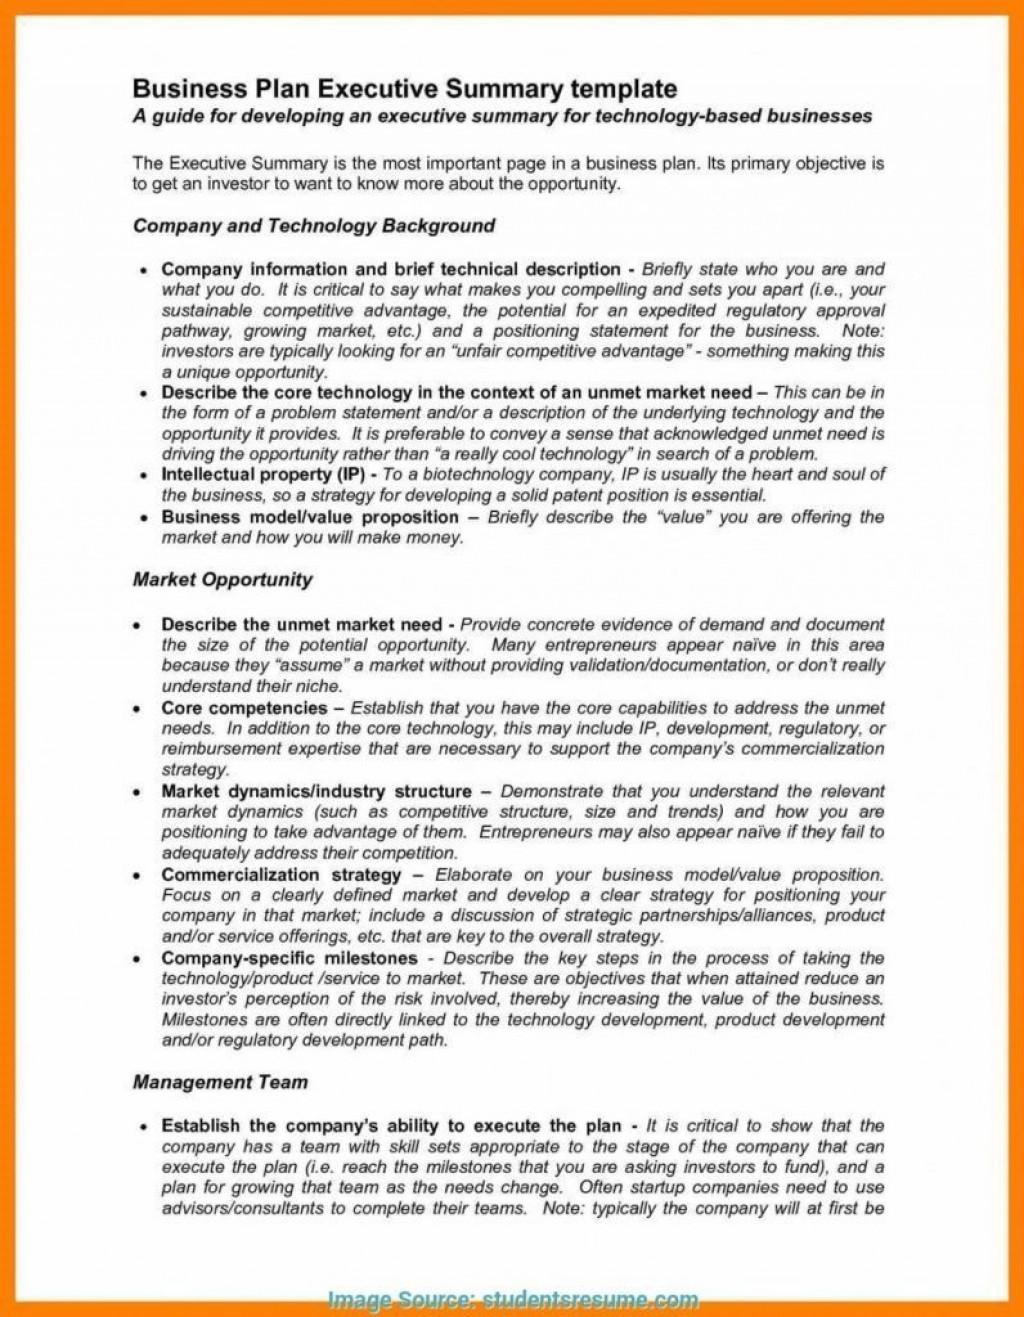 Business Plan Executive Summary Template Addictionary